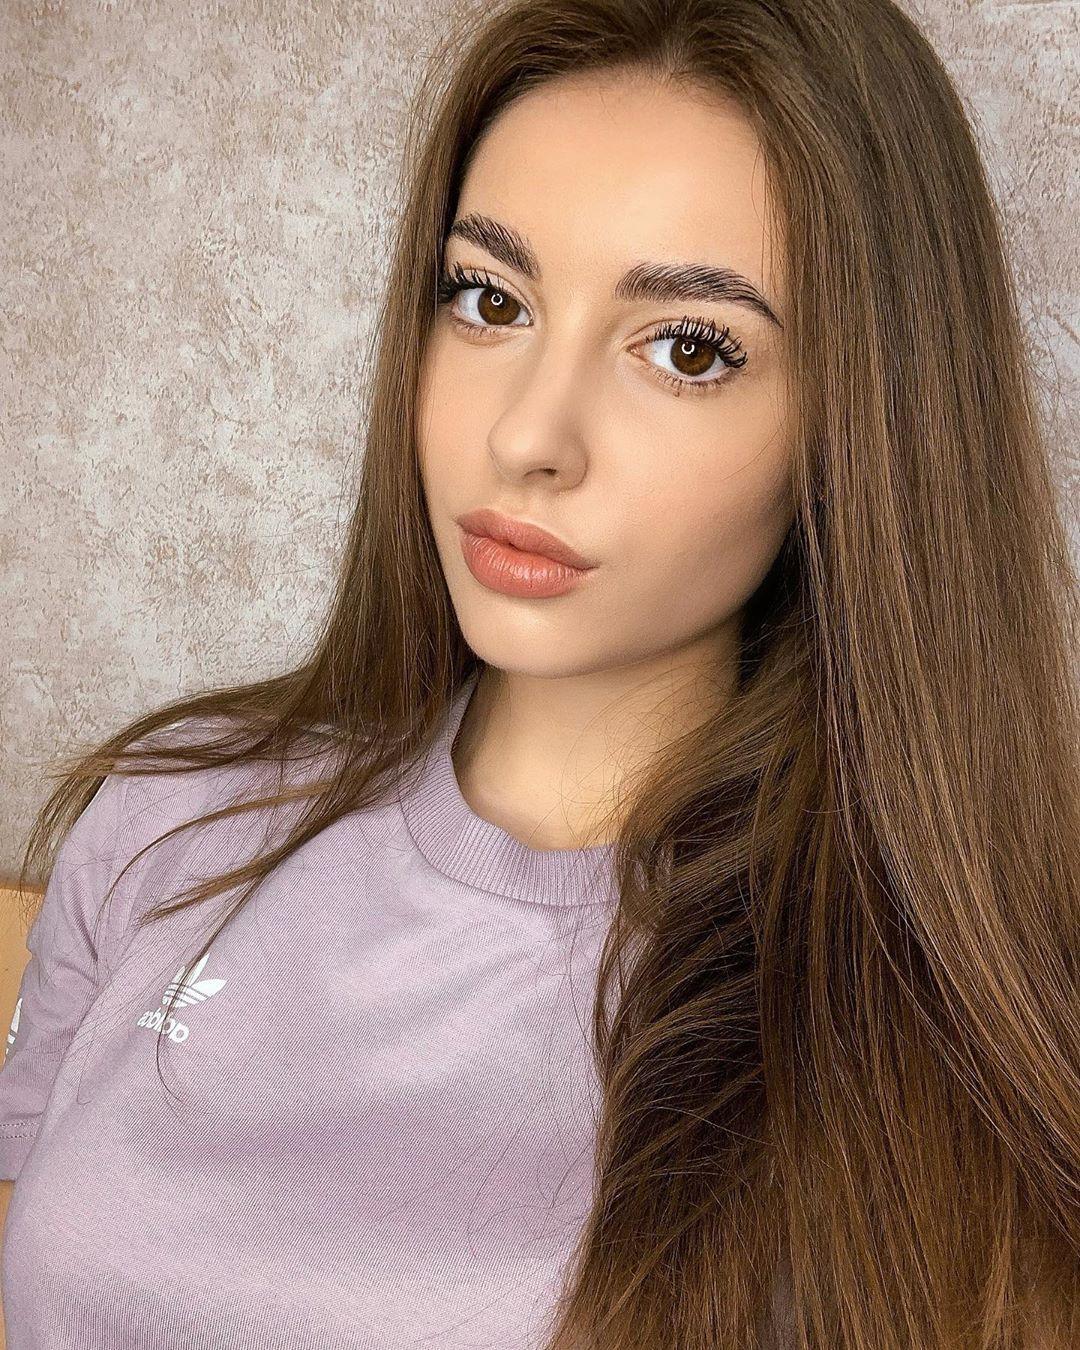 Olga-Seliverstova-Wallpapers-Insta-Fit-Bio-7